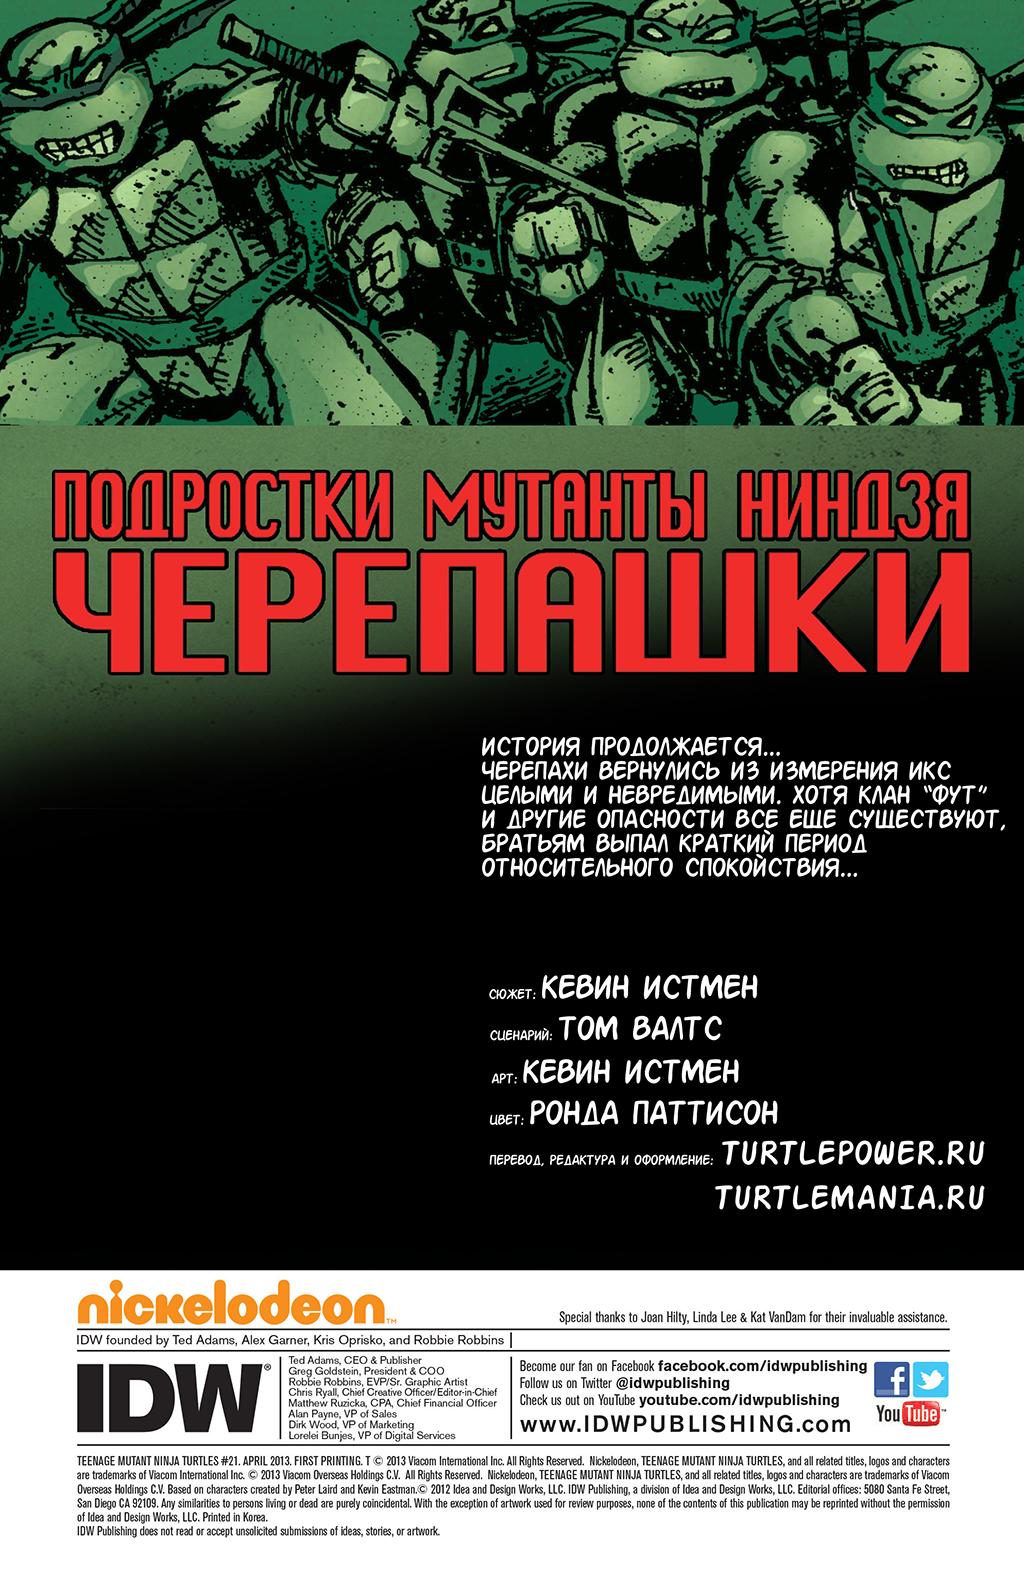 Комикс Подростки Мутанты Ниндзя Черепашки том 5